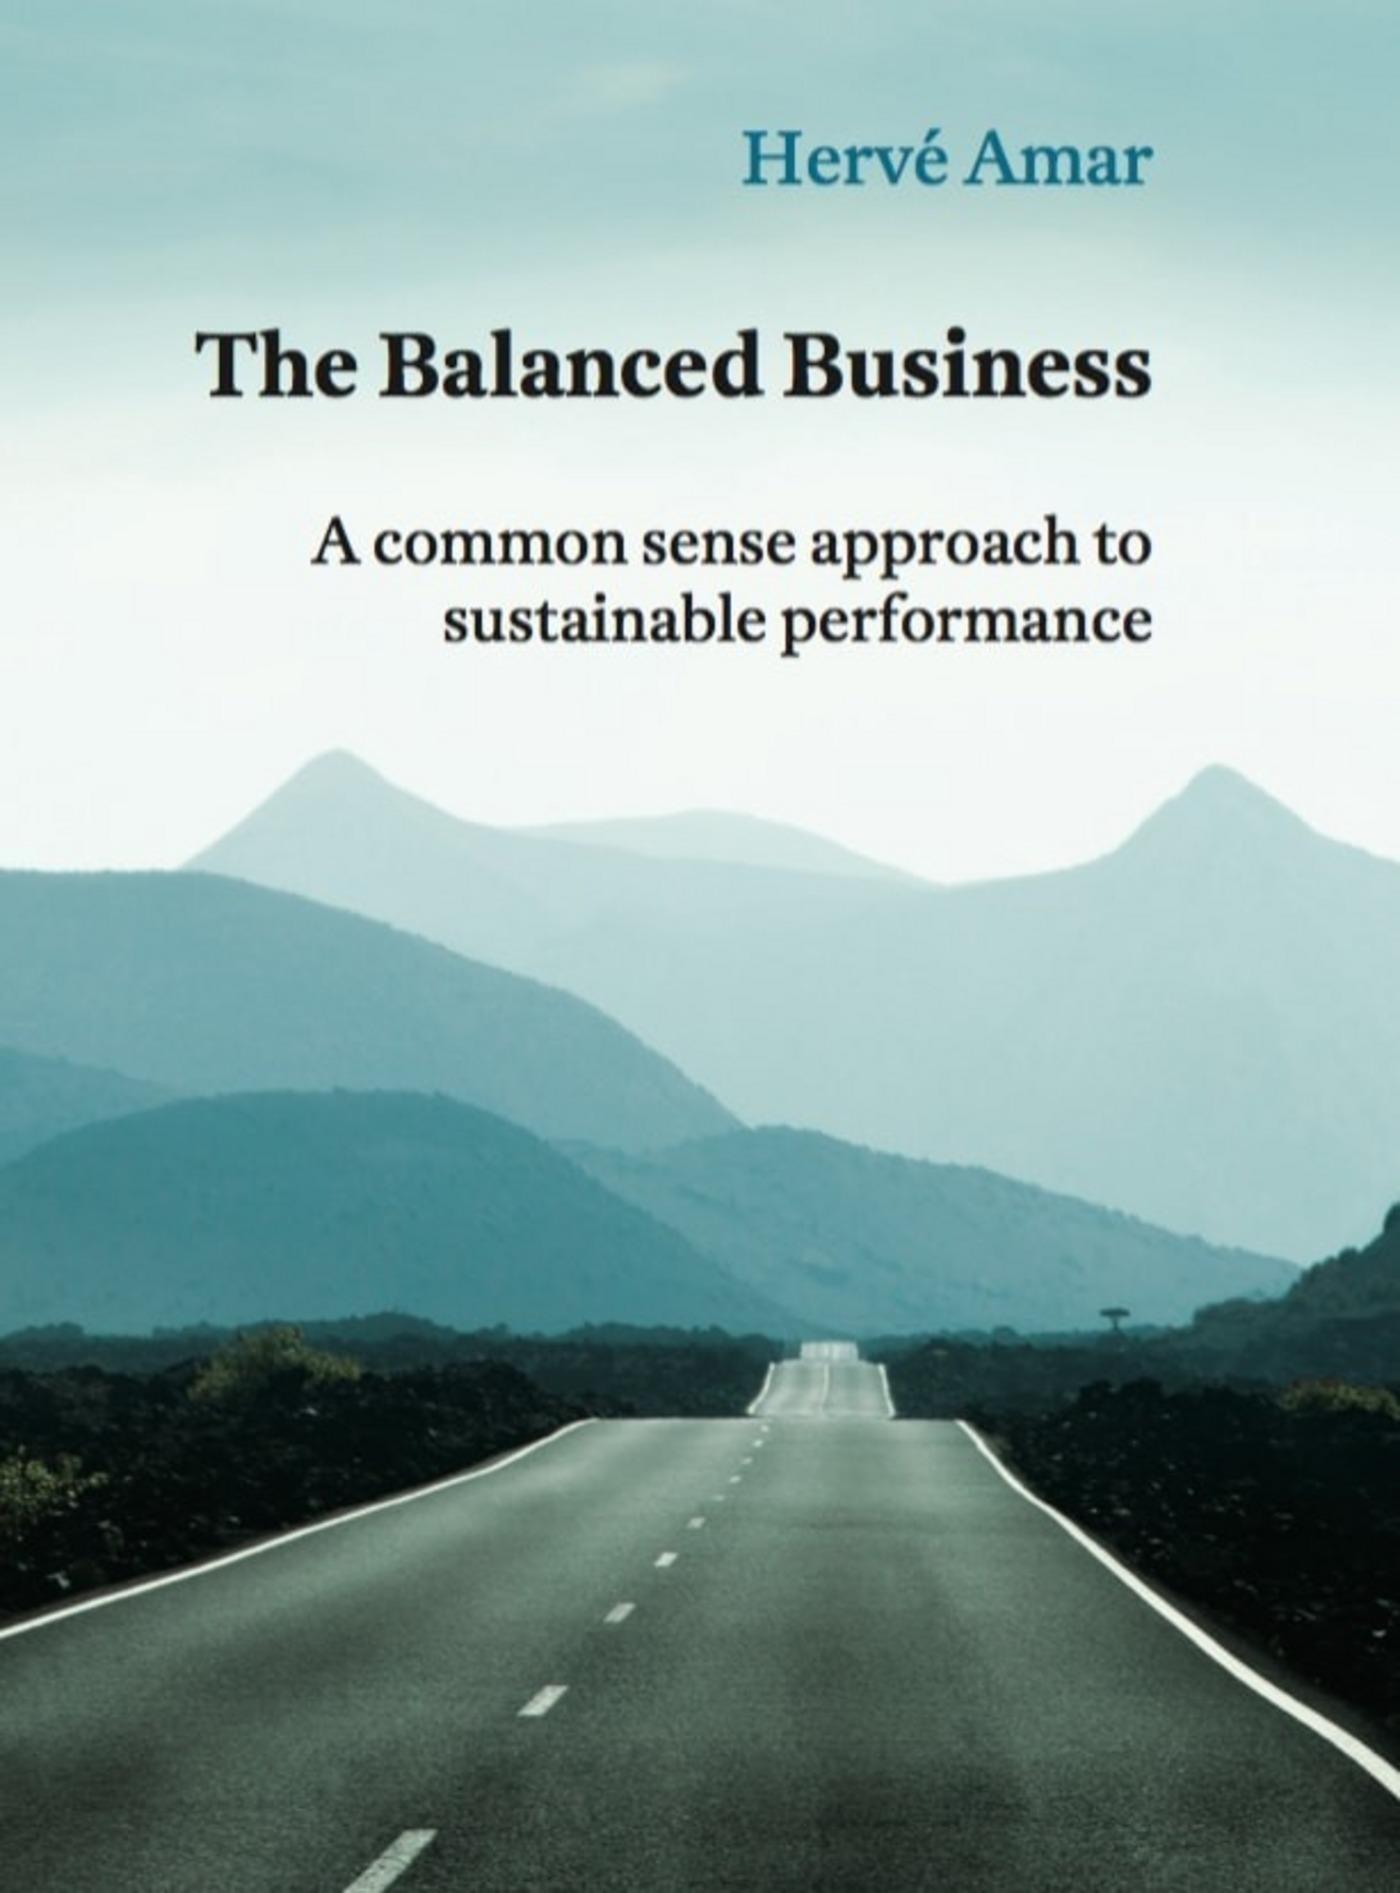 The balanced business